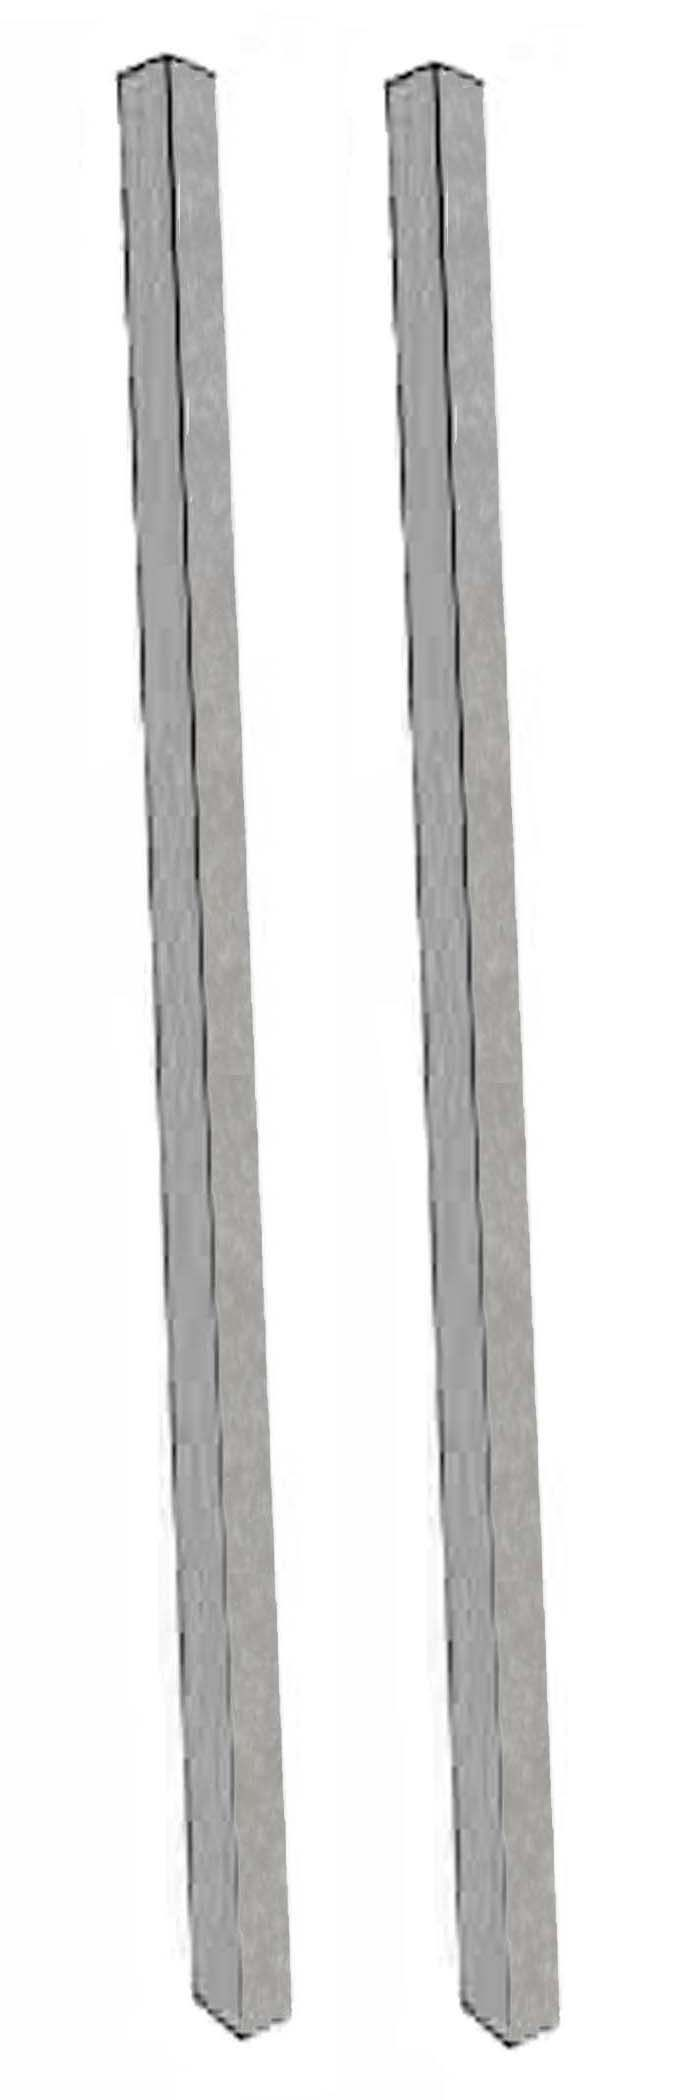 Aarco Products DPP-2 Light Grey Plastic Lumber Post Set